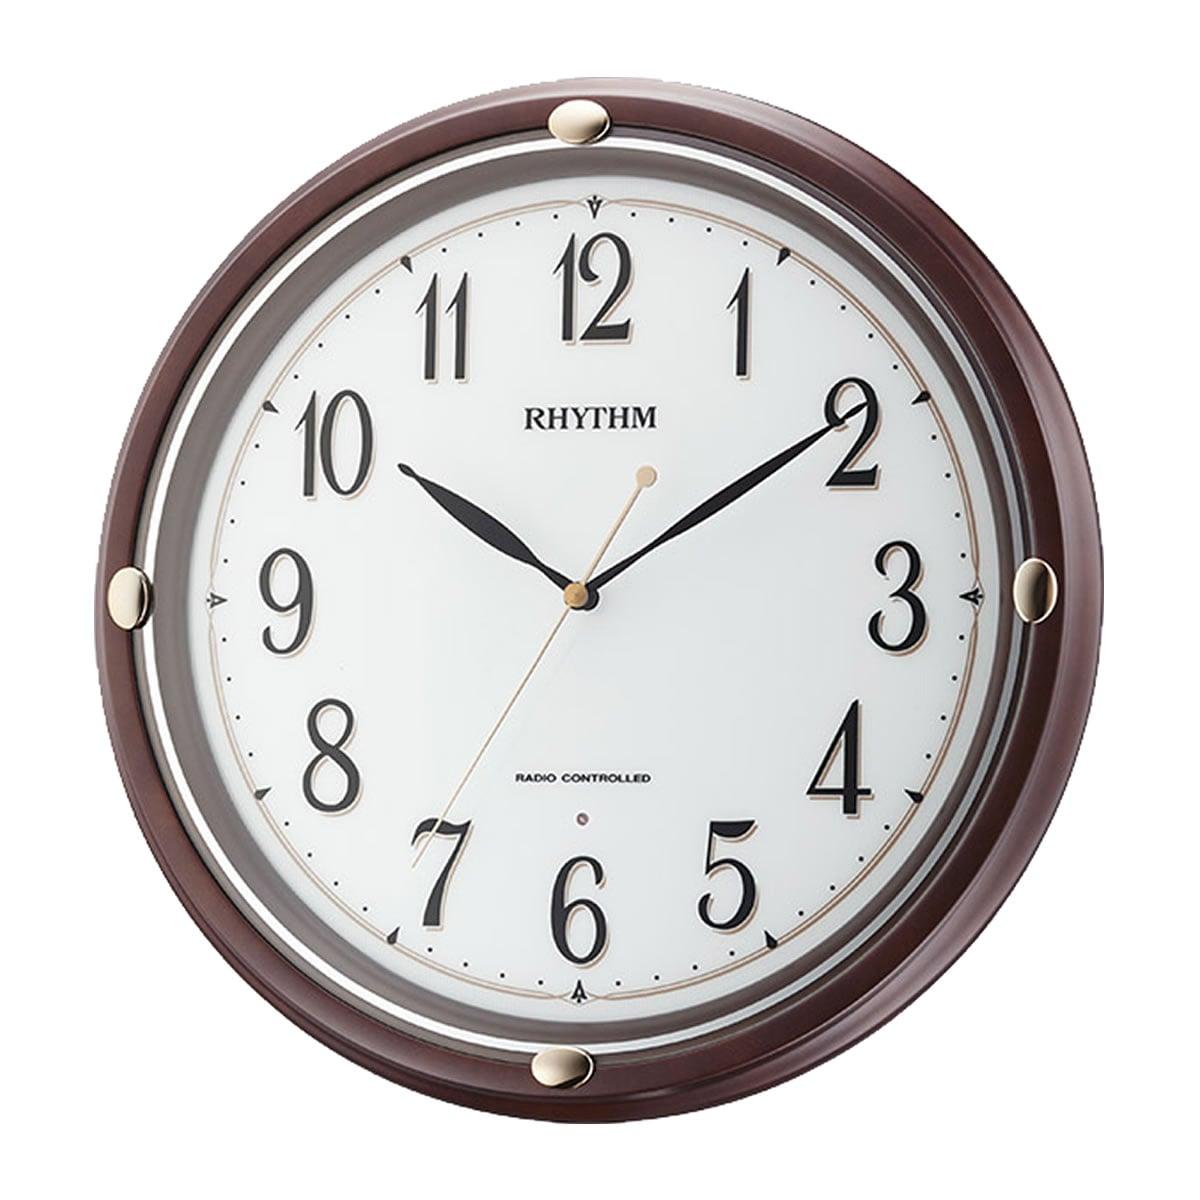 RHYTHM(リズム) 電波掛け時計 フィットウェーブフーガ 茶色 8MYA29SR06